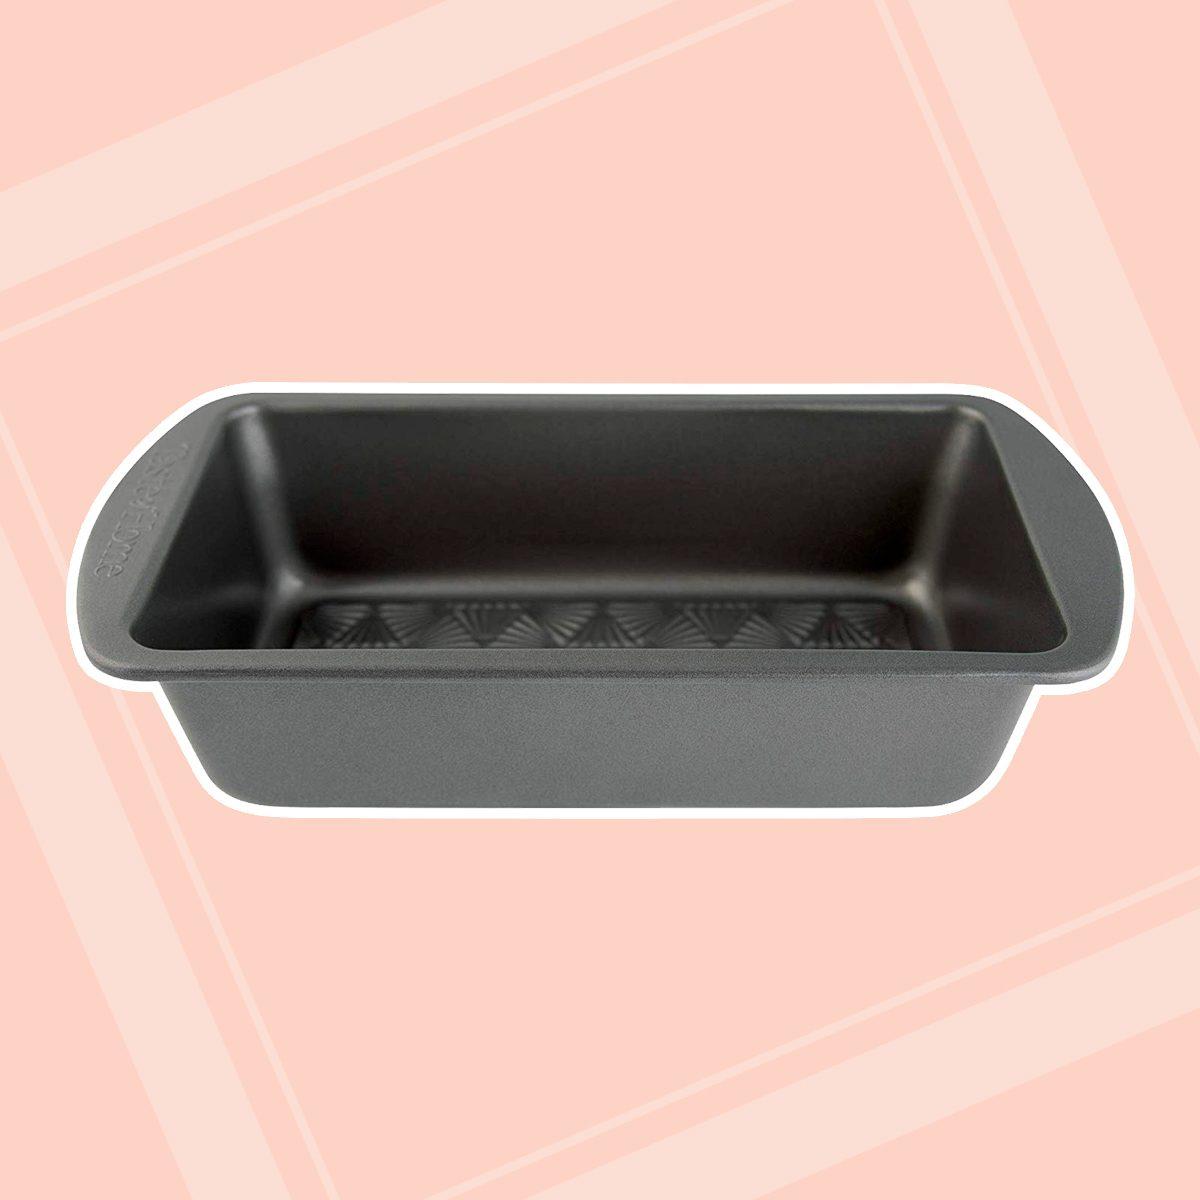 9 x 5 inch Non-Stick Metal Loaf Pan